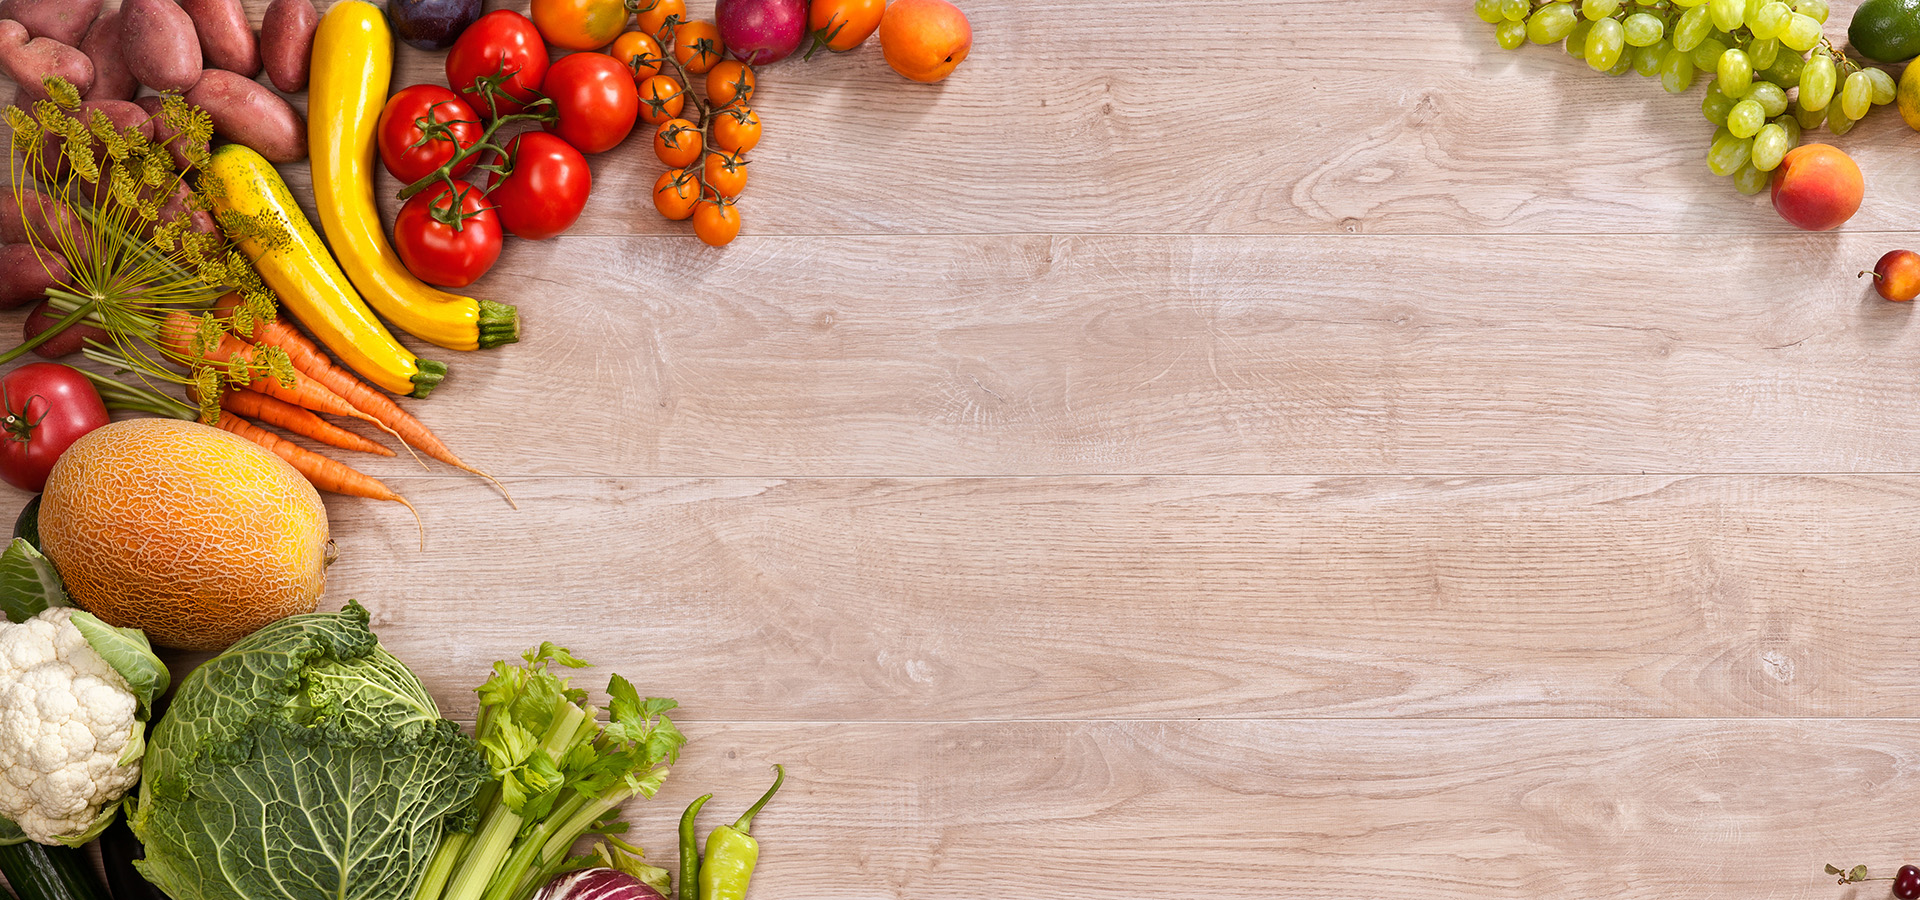 frutas alimentos fresco vegetales antecedentes dieta